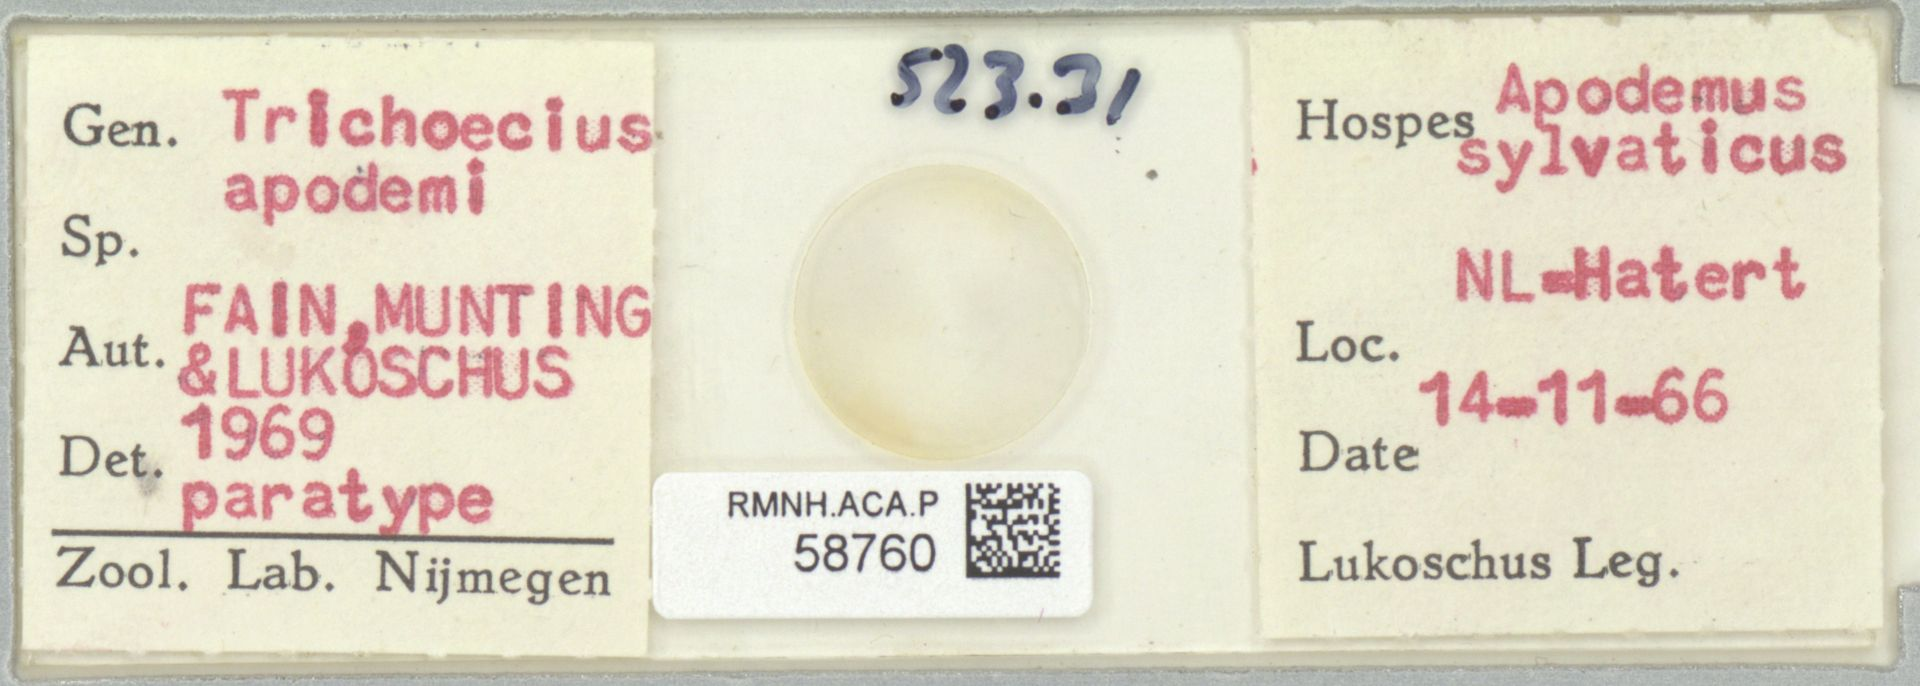 RMNH.ACA.P.58760 | Trichoecius apodemi Fain, Munting & Lukoschus 1969